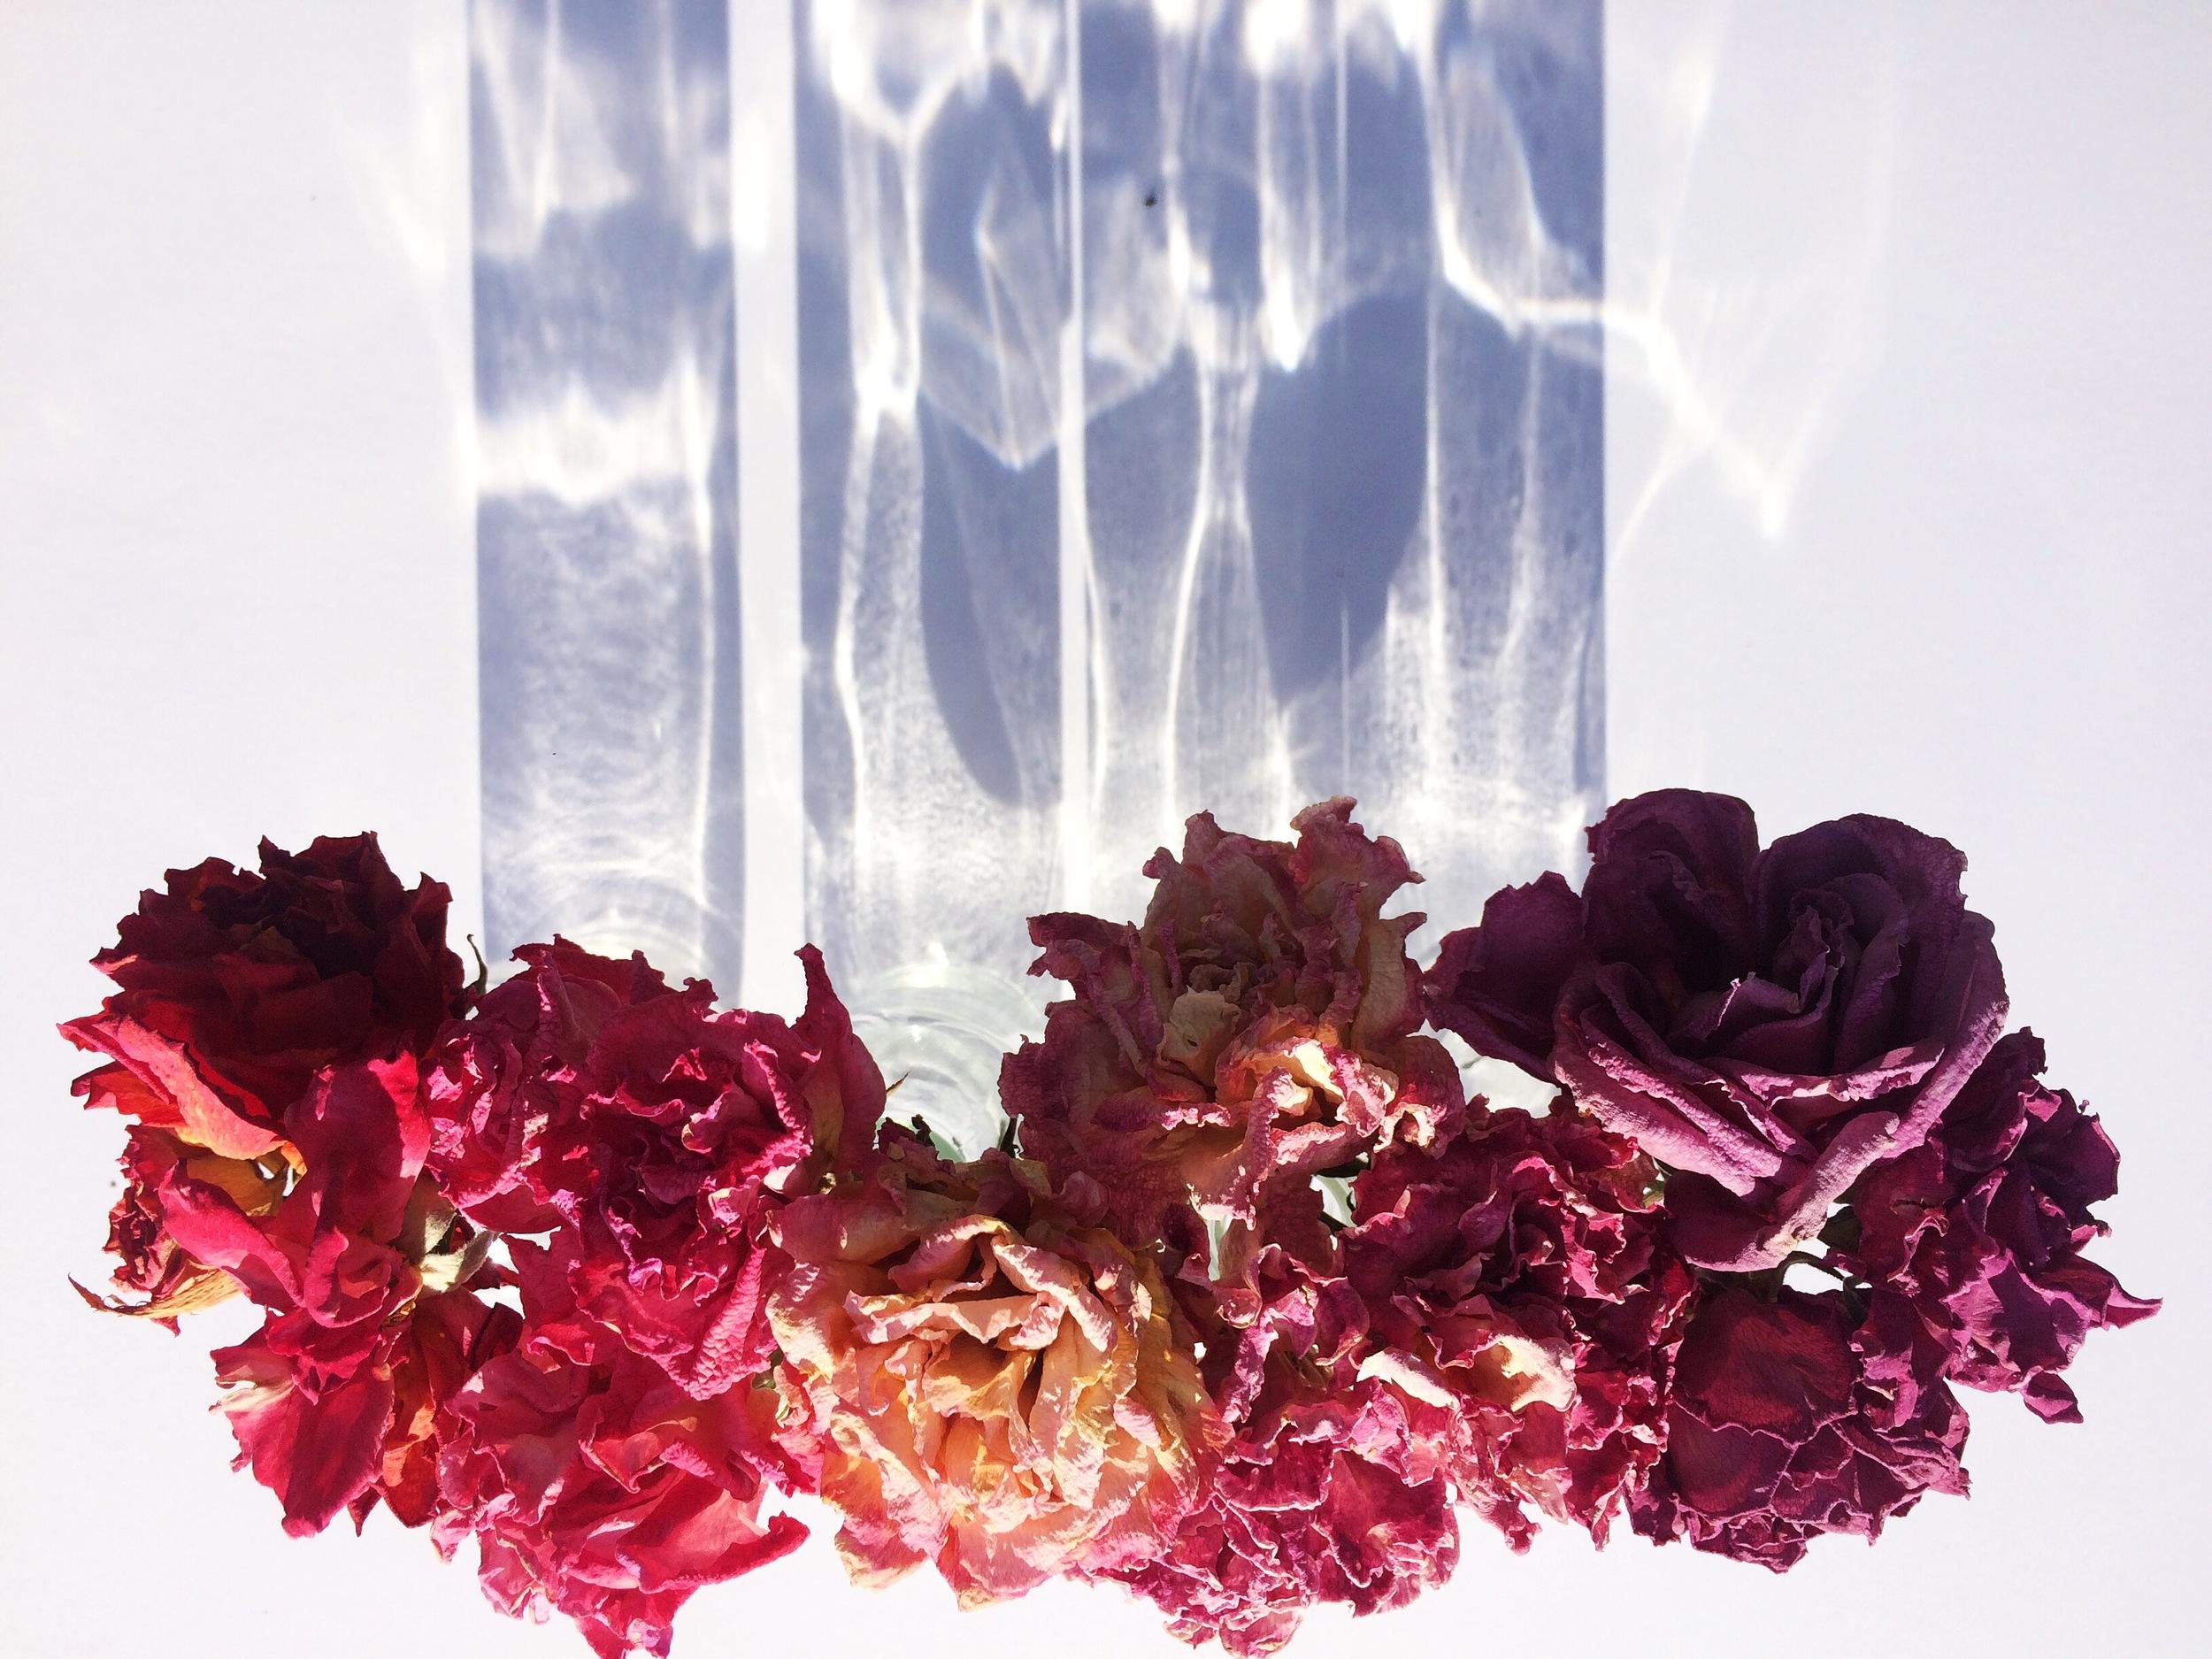 Dead Flowers Series